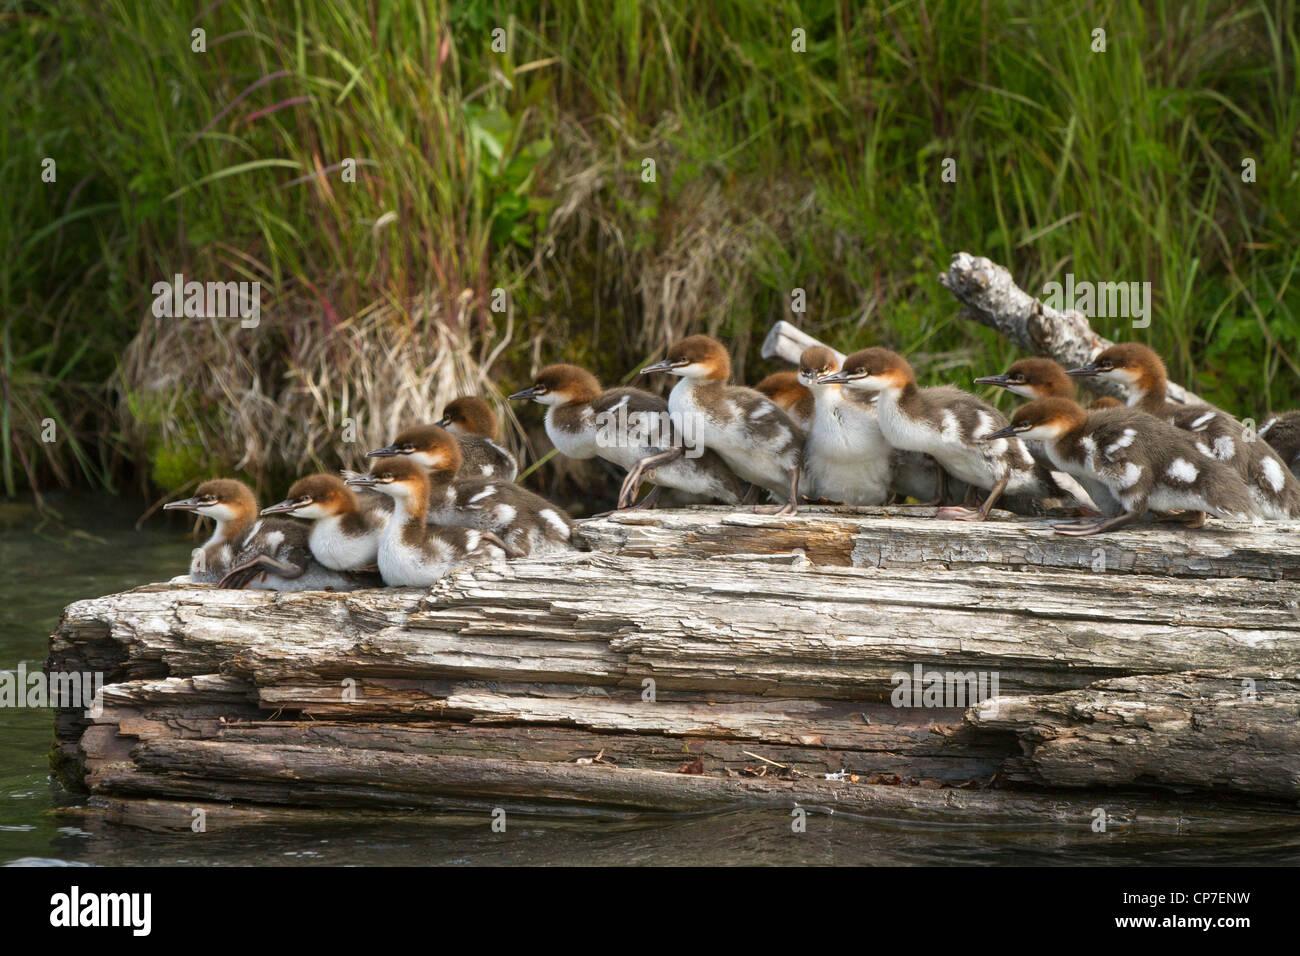 A large brood of Common Merganser ducklings rest on a log, Cooper Landing, Southcentral Alaska, Summer - Stock Image